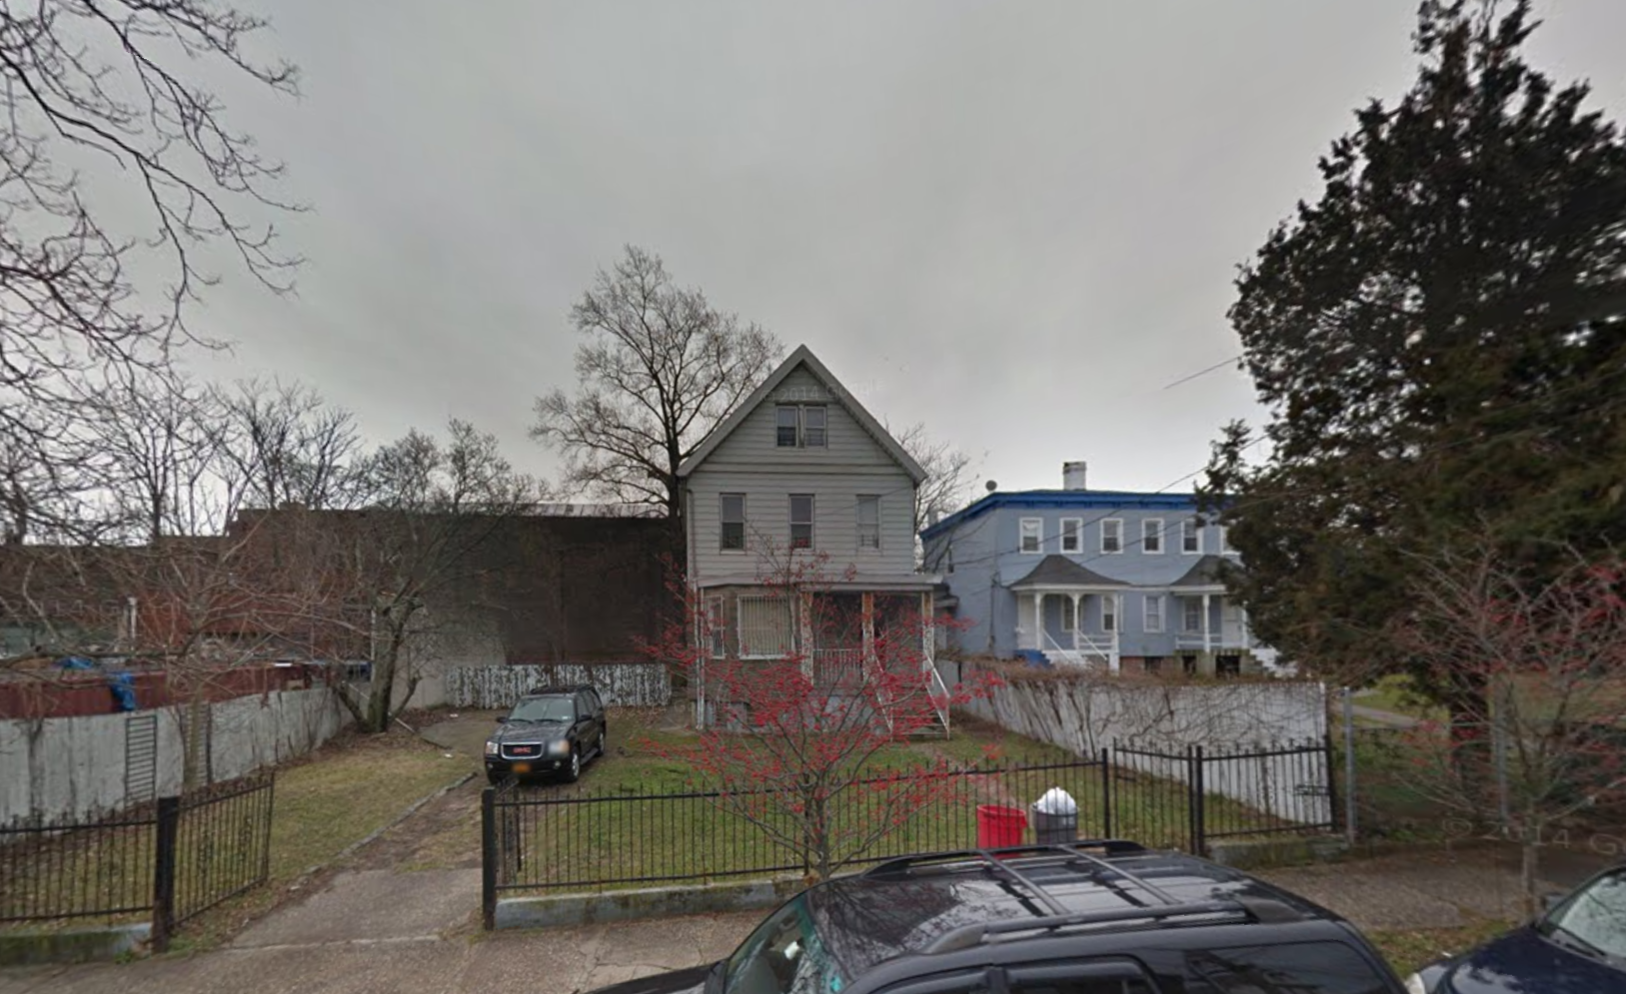 84 Prospect Street, image via Google Maps